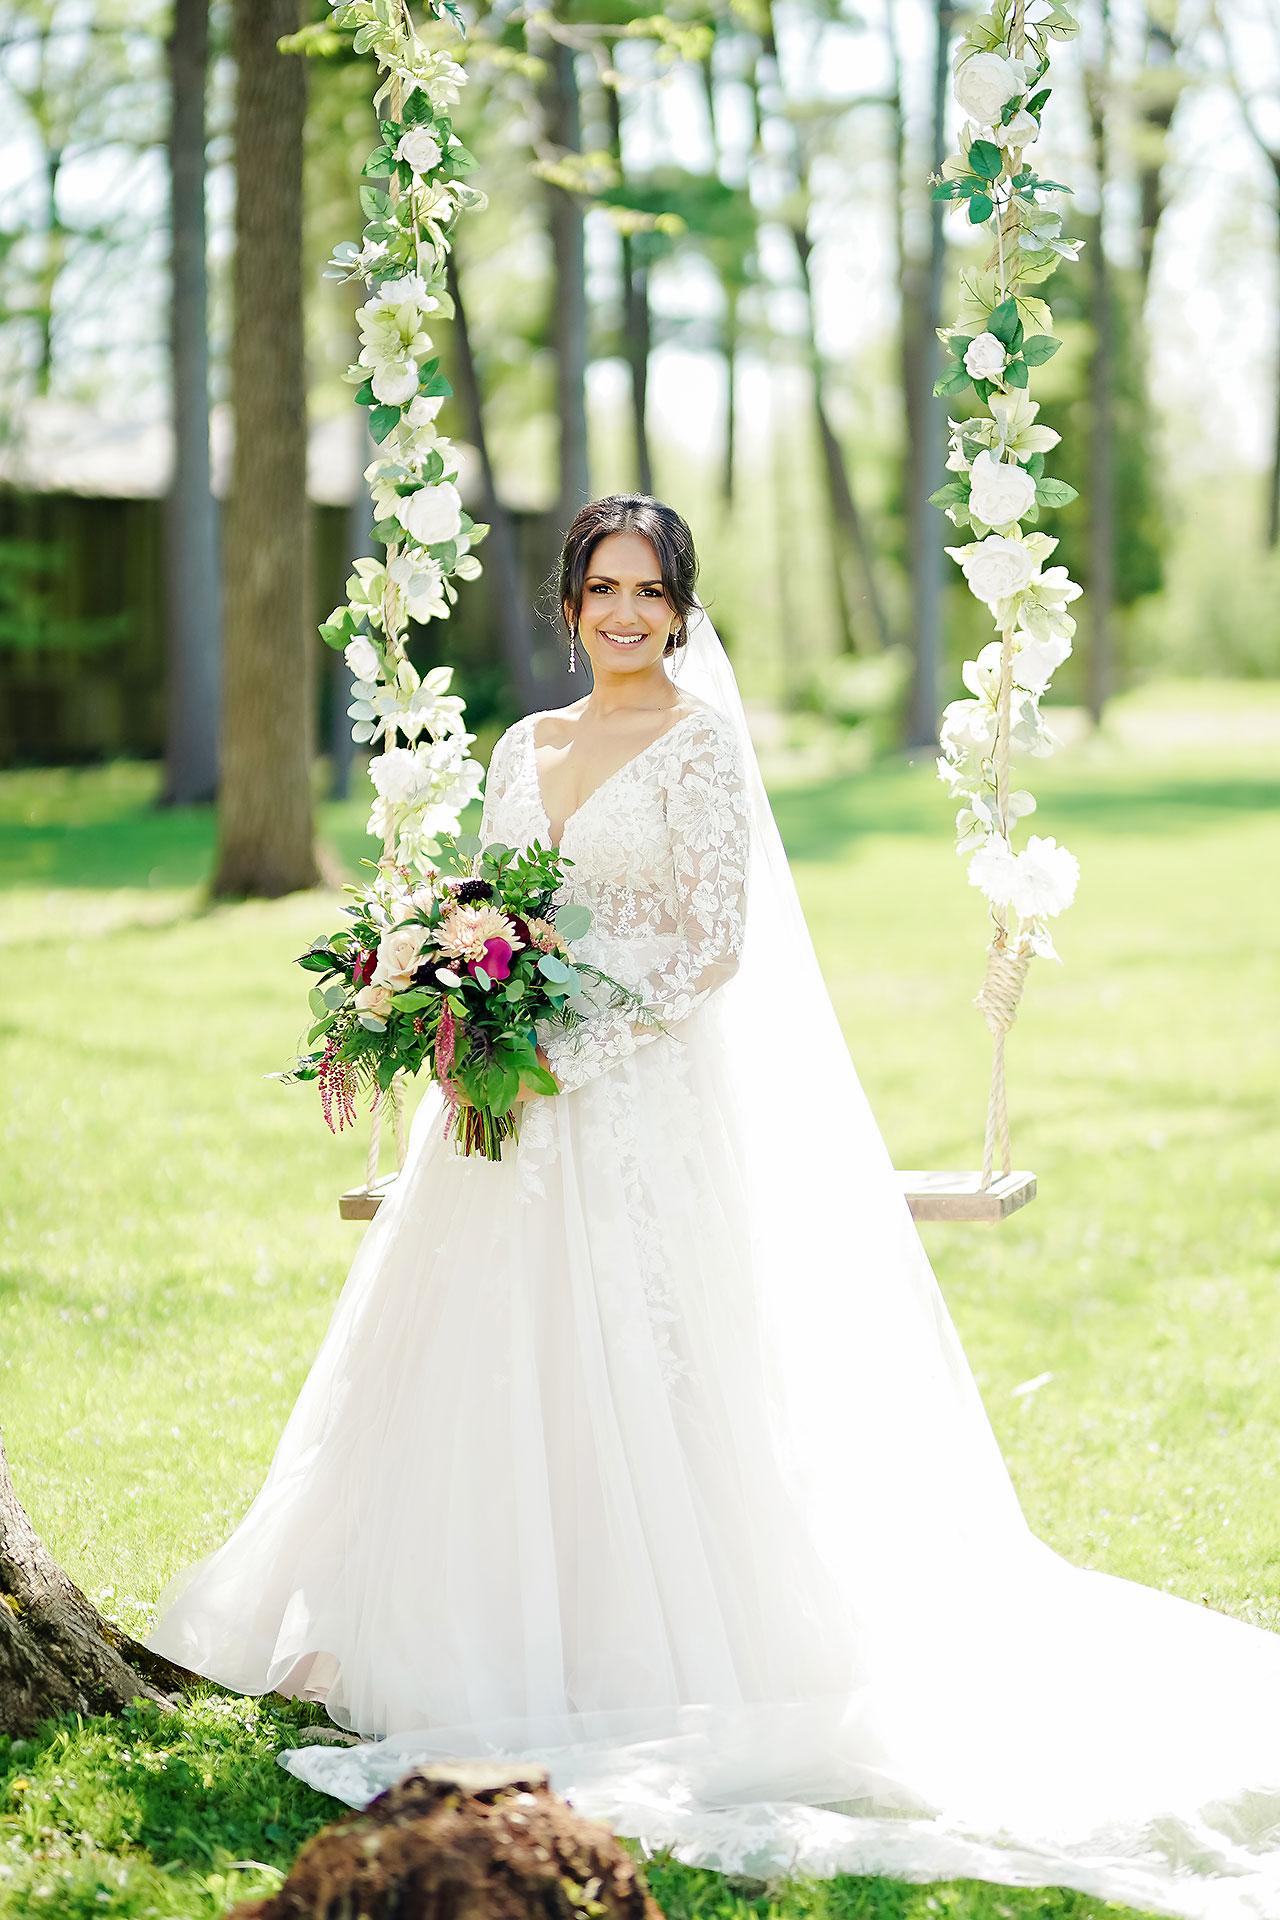 Nadia Parker Black Iris Estate Carmel Indiana Wedding May 2021 066